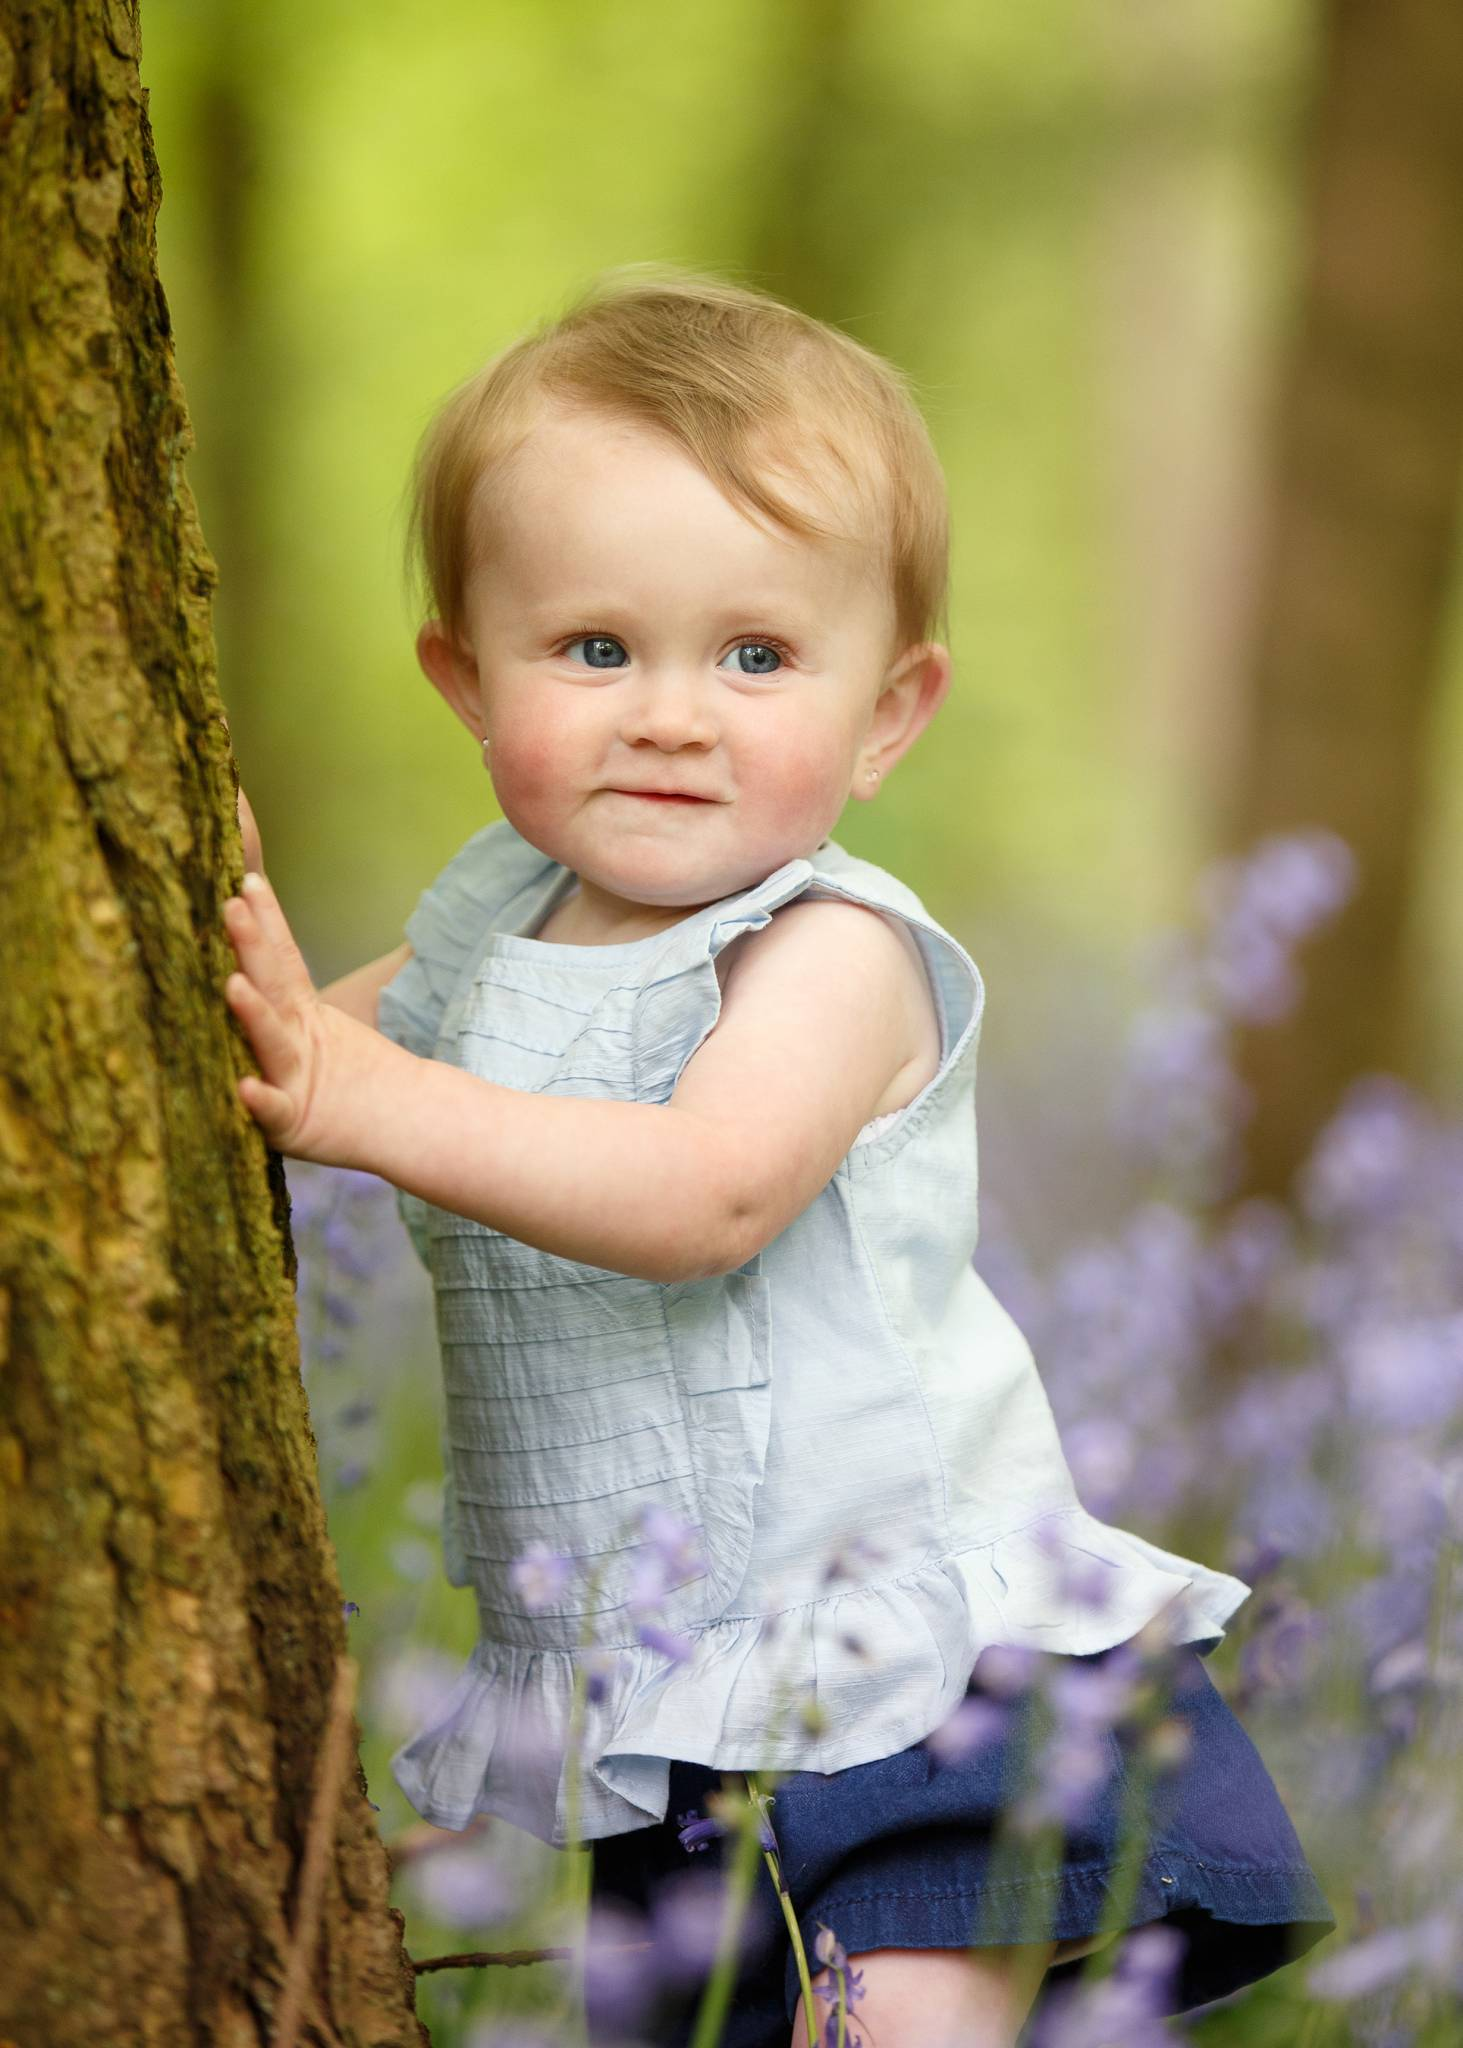 Location Photoshoot, family photoshoot, children photoshoot, high wycombe, buckinghamshire